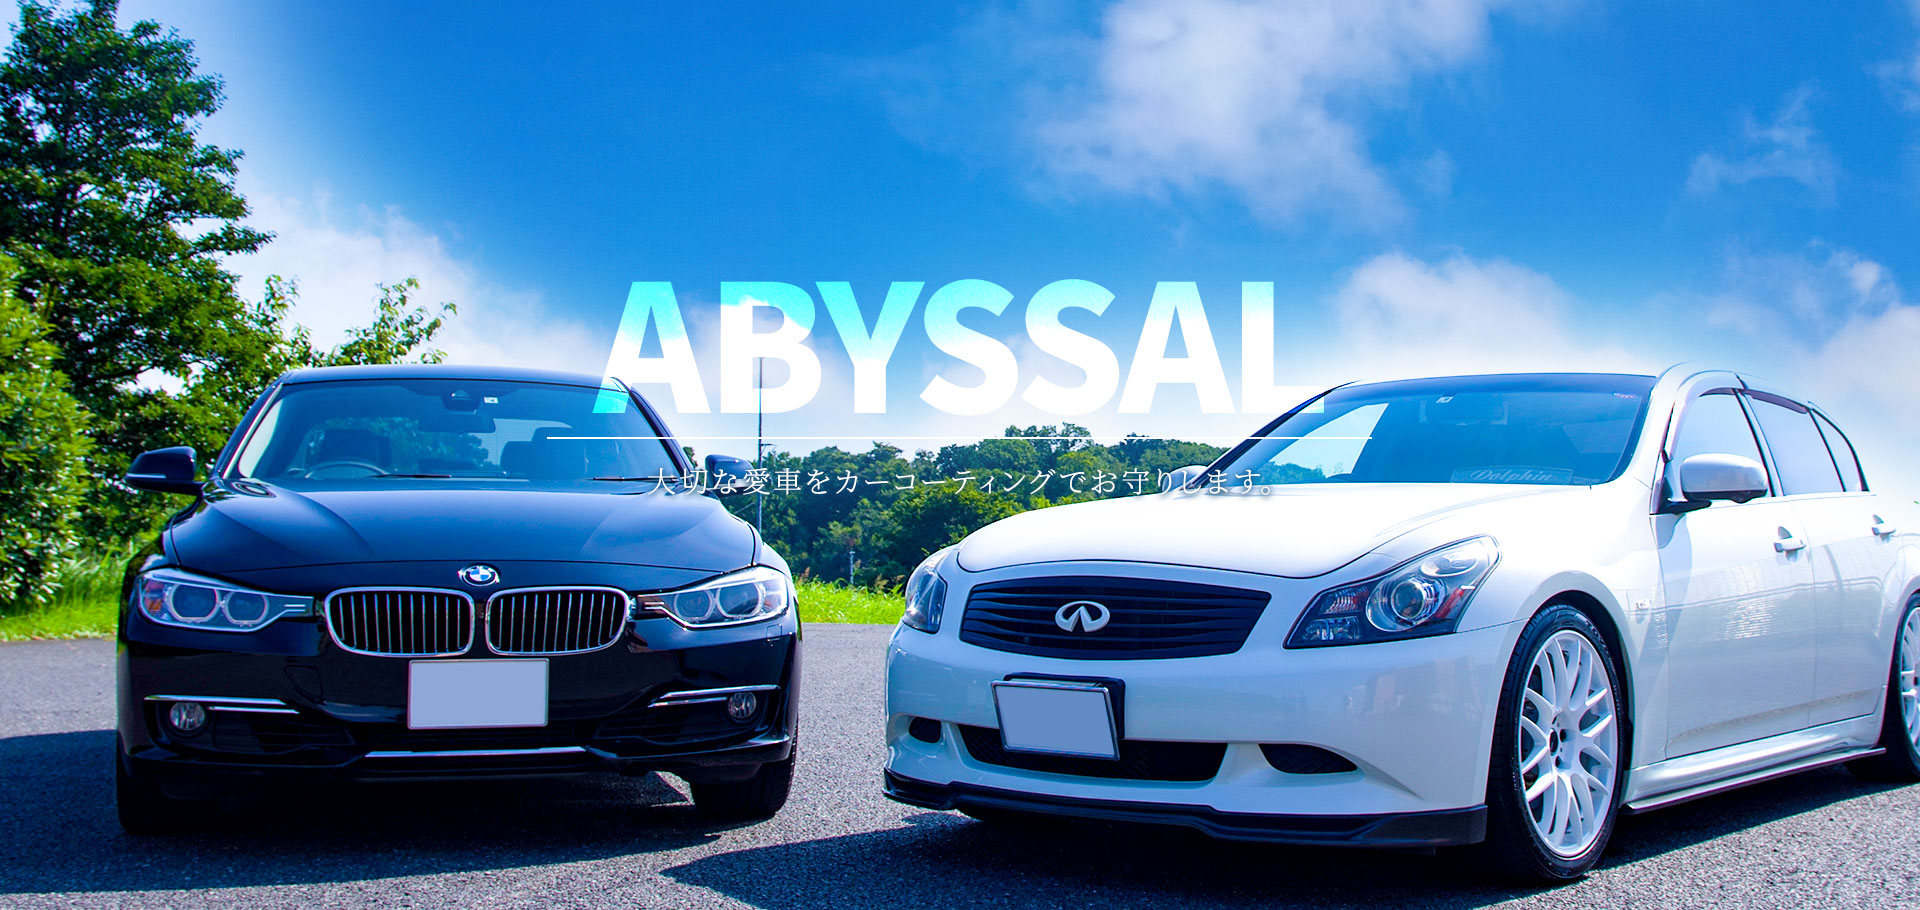 株式会社Abyssal